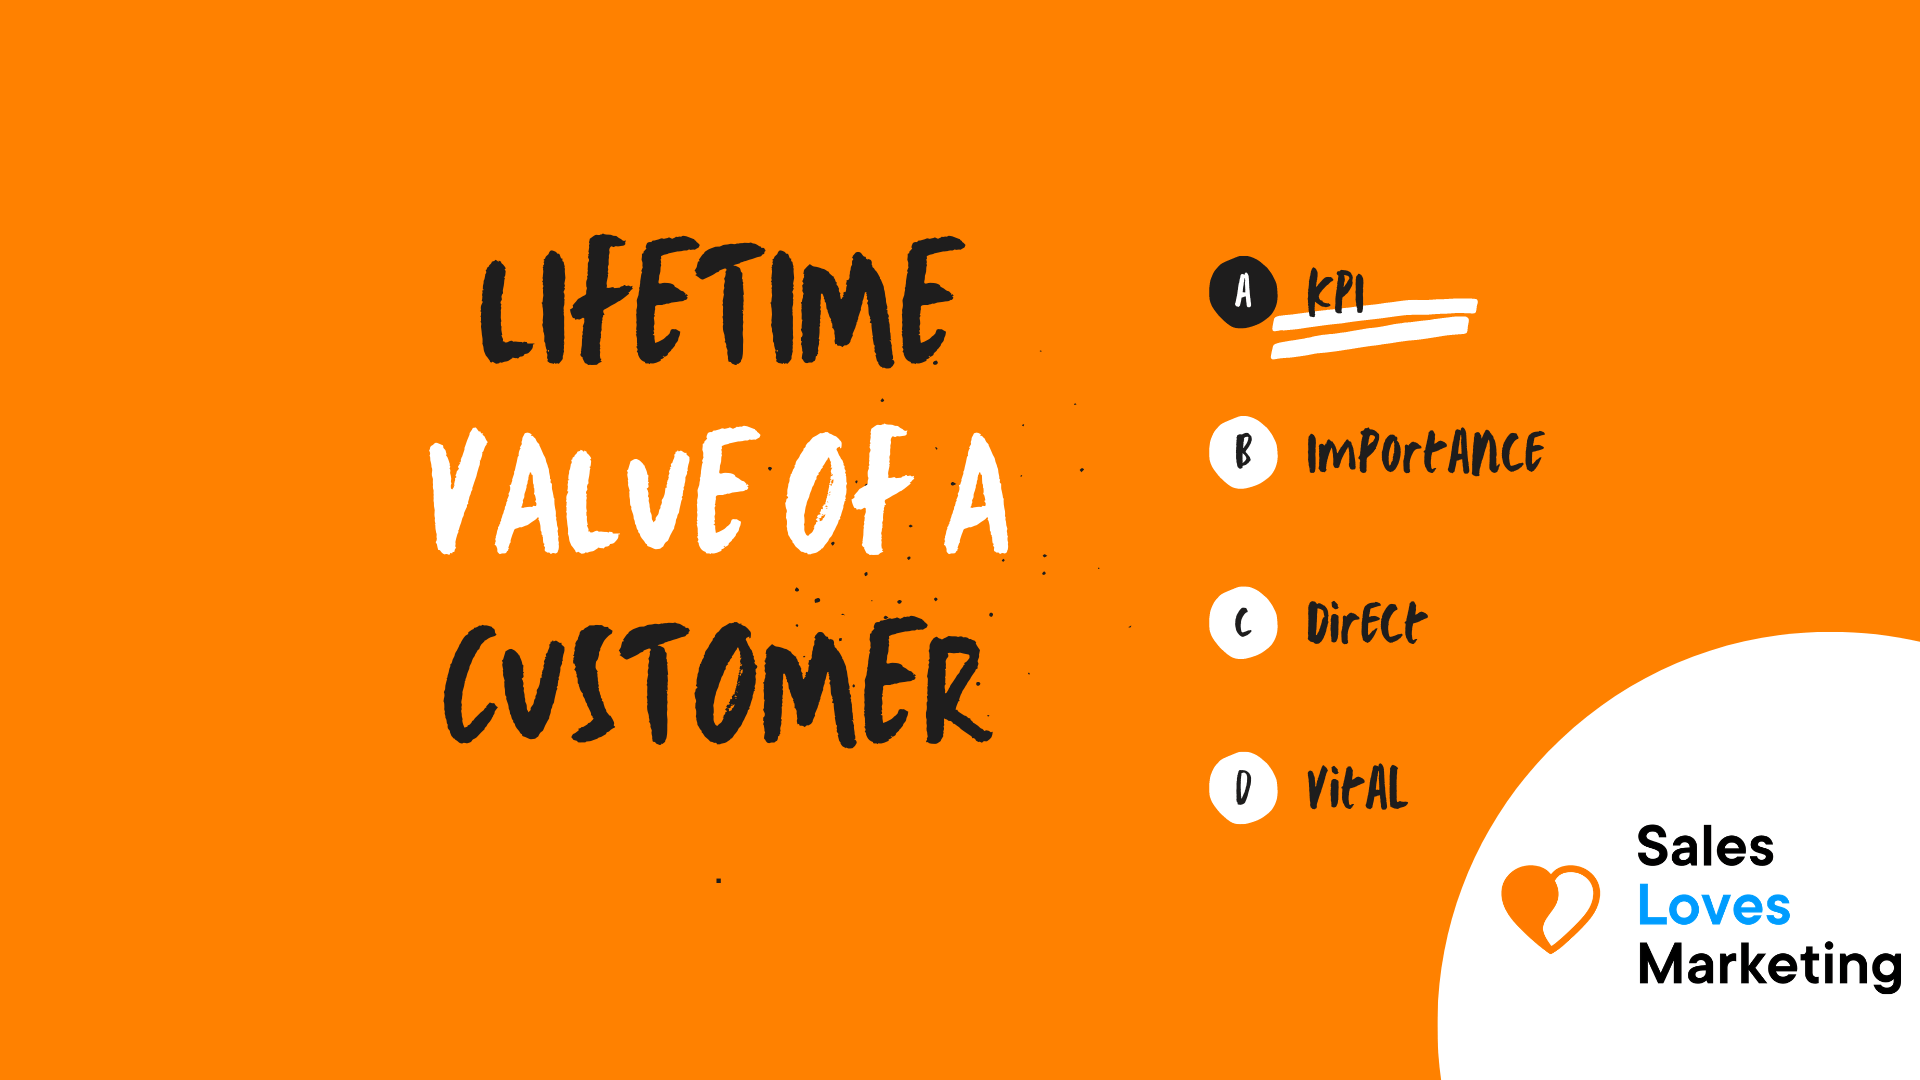 Lifetime Value of a Customer (CLV)